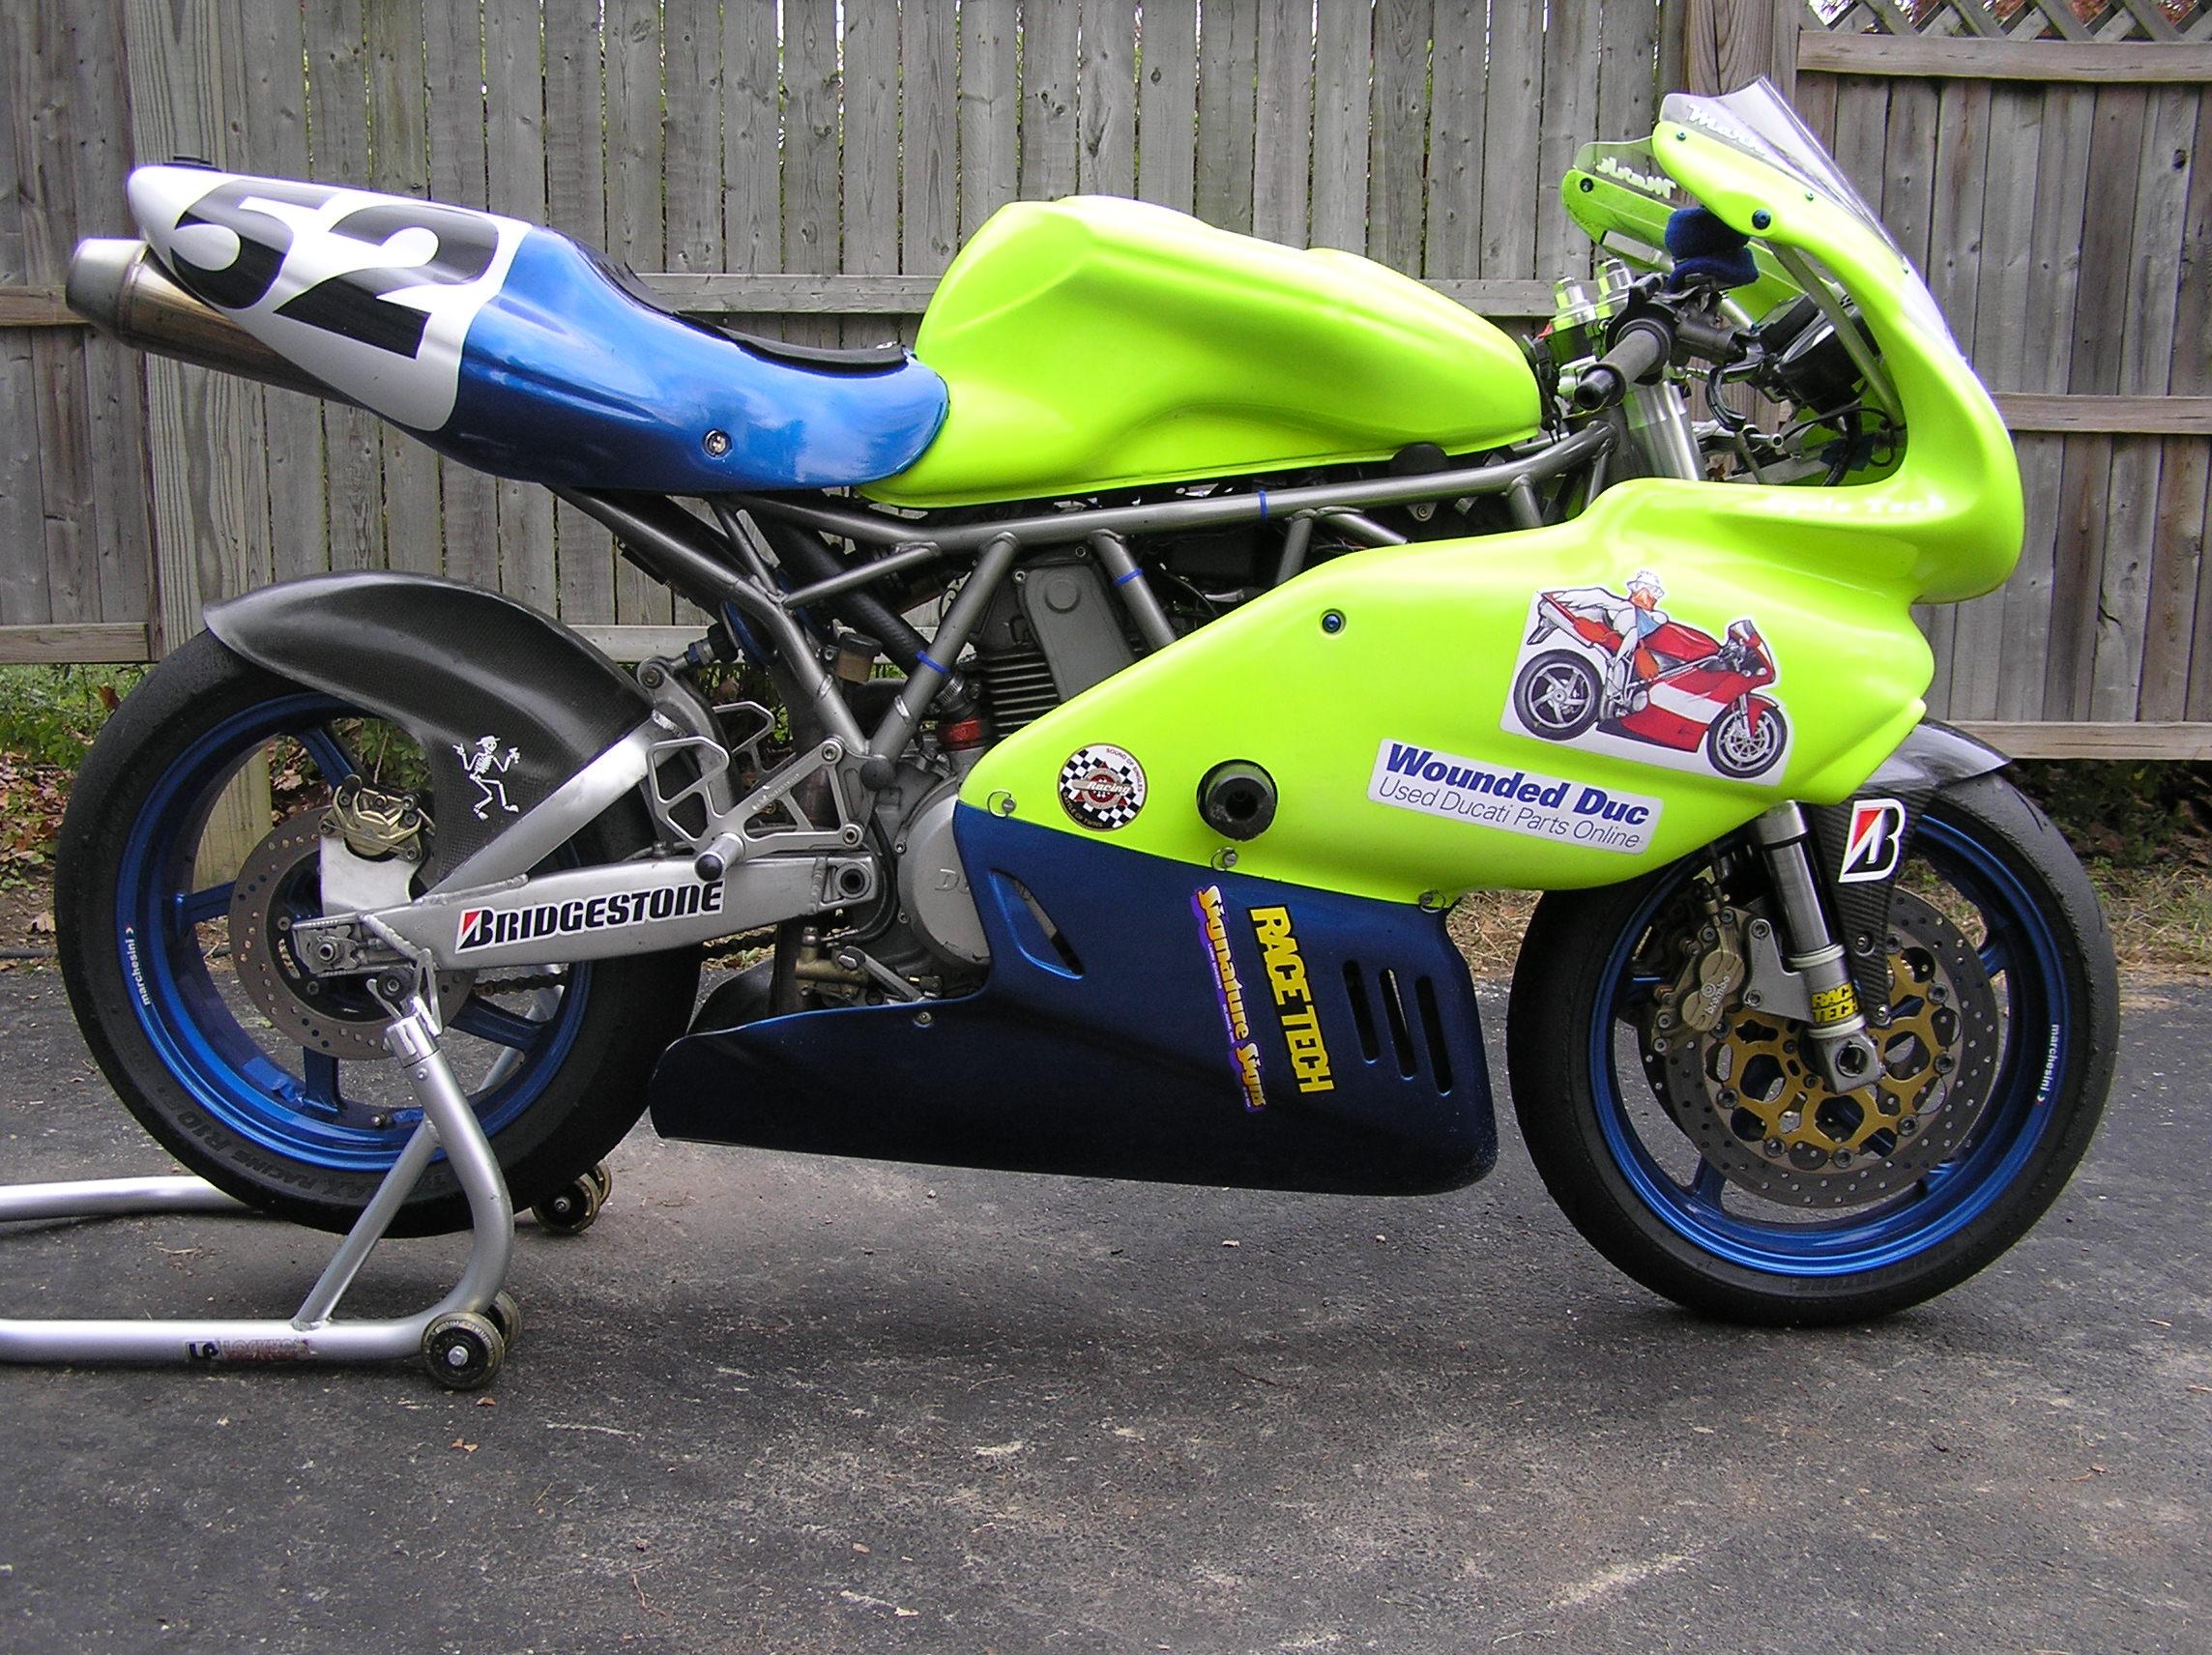 ducati racebike for sale - ducati.ms - the ultimate ducati forum